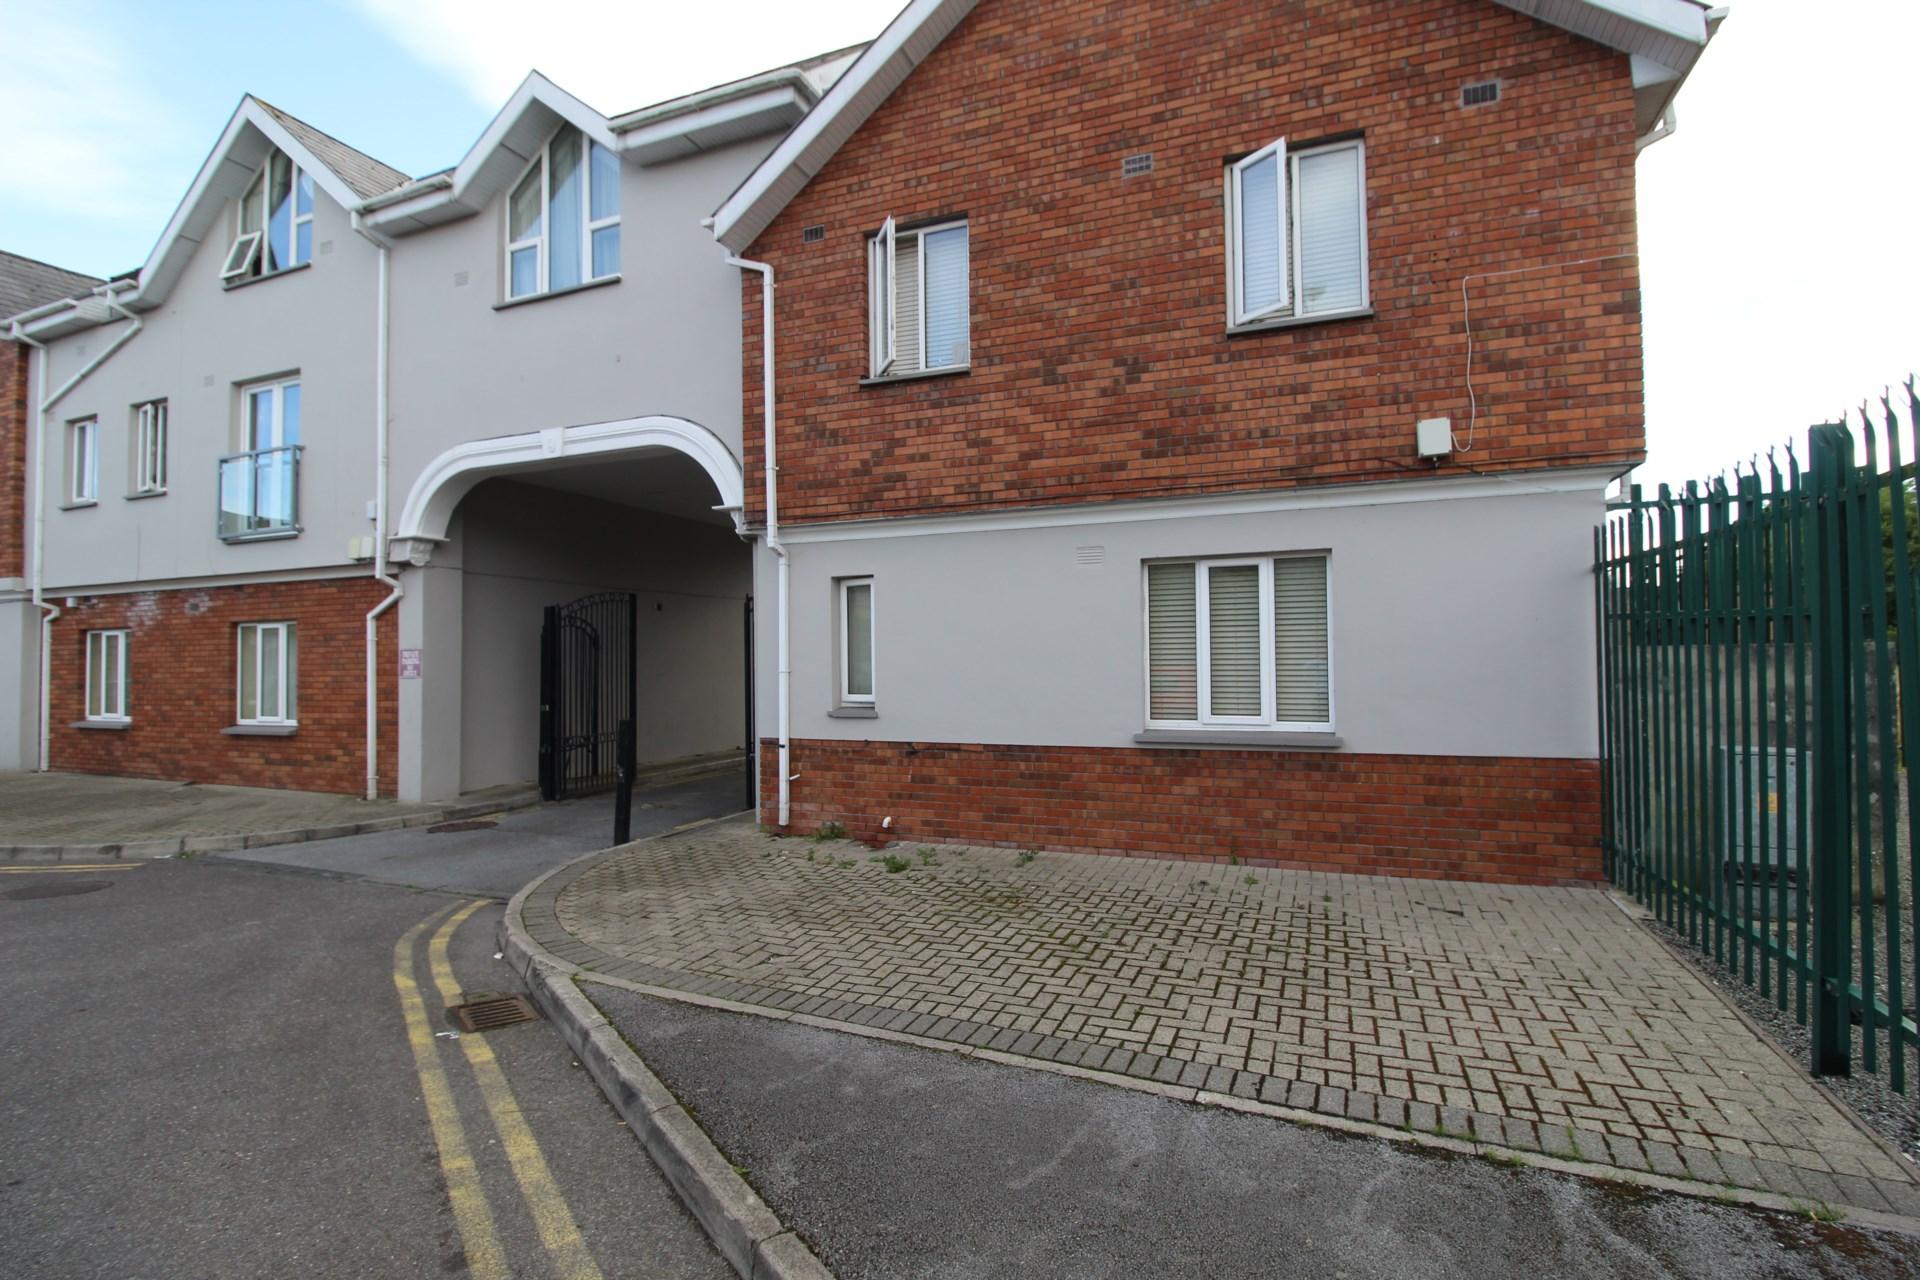 11 Chapel Court, Chapel Lane, Killarney, County Kerry, V93 T622